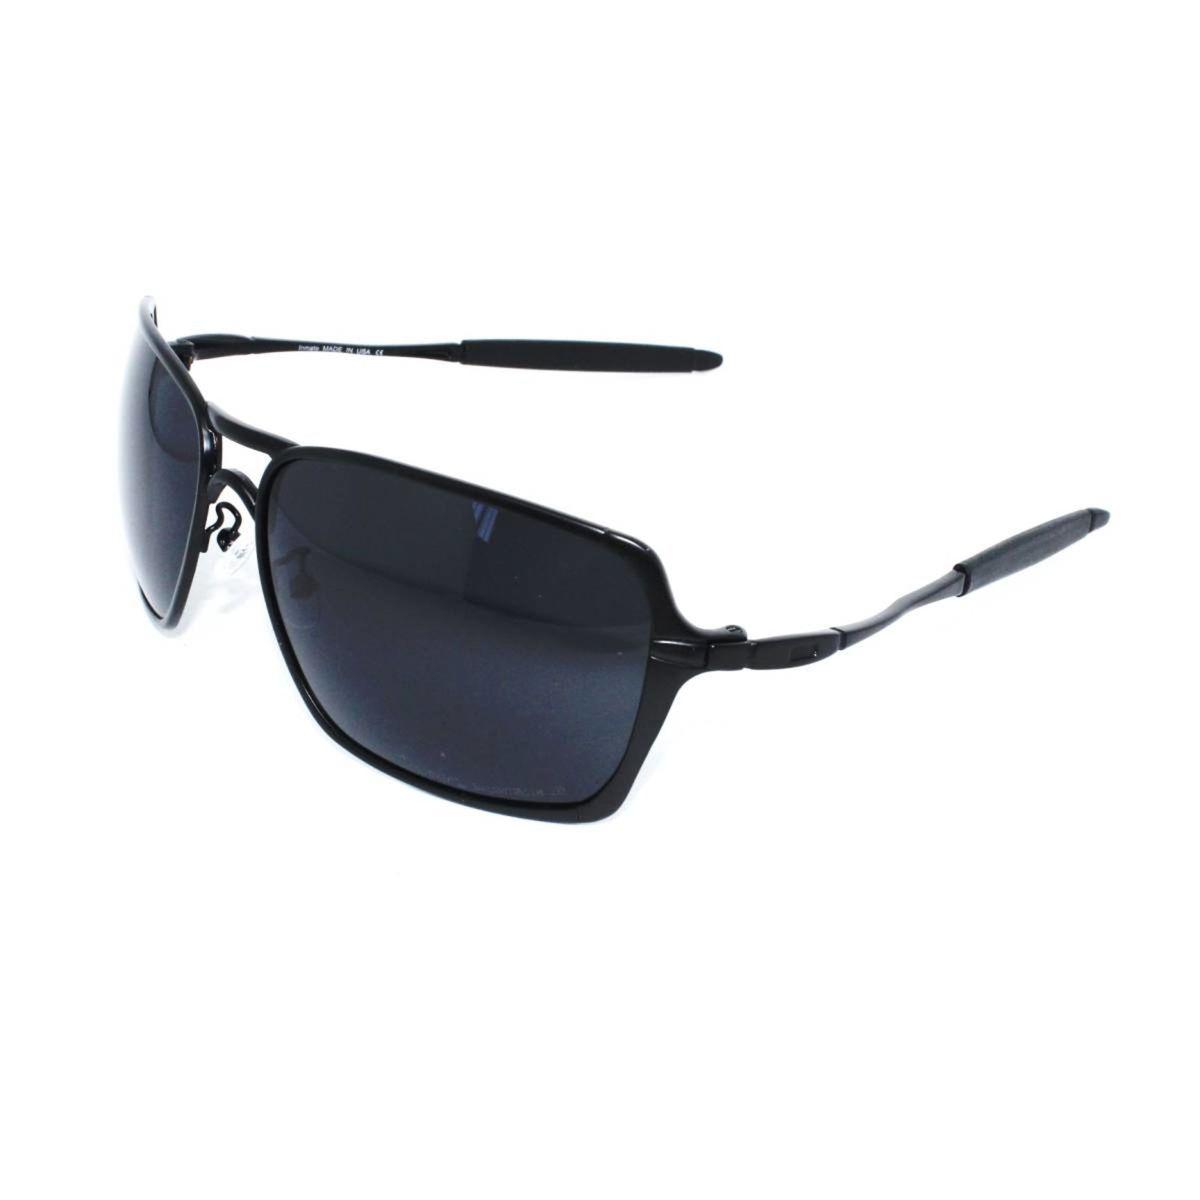 55c25983745b2 Óculos Oakley Inmate 100% Polarizado Promoção!!!